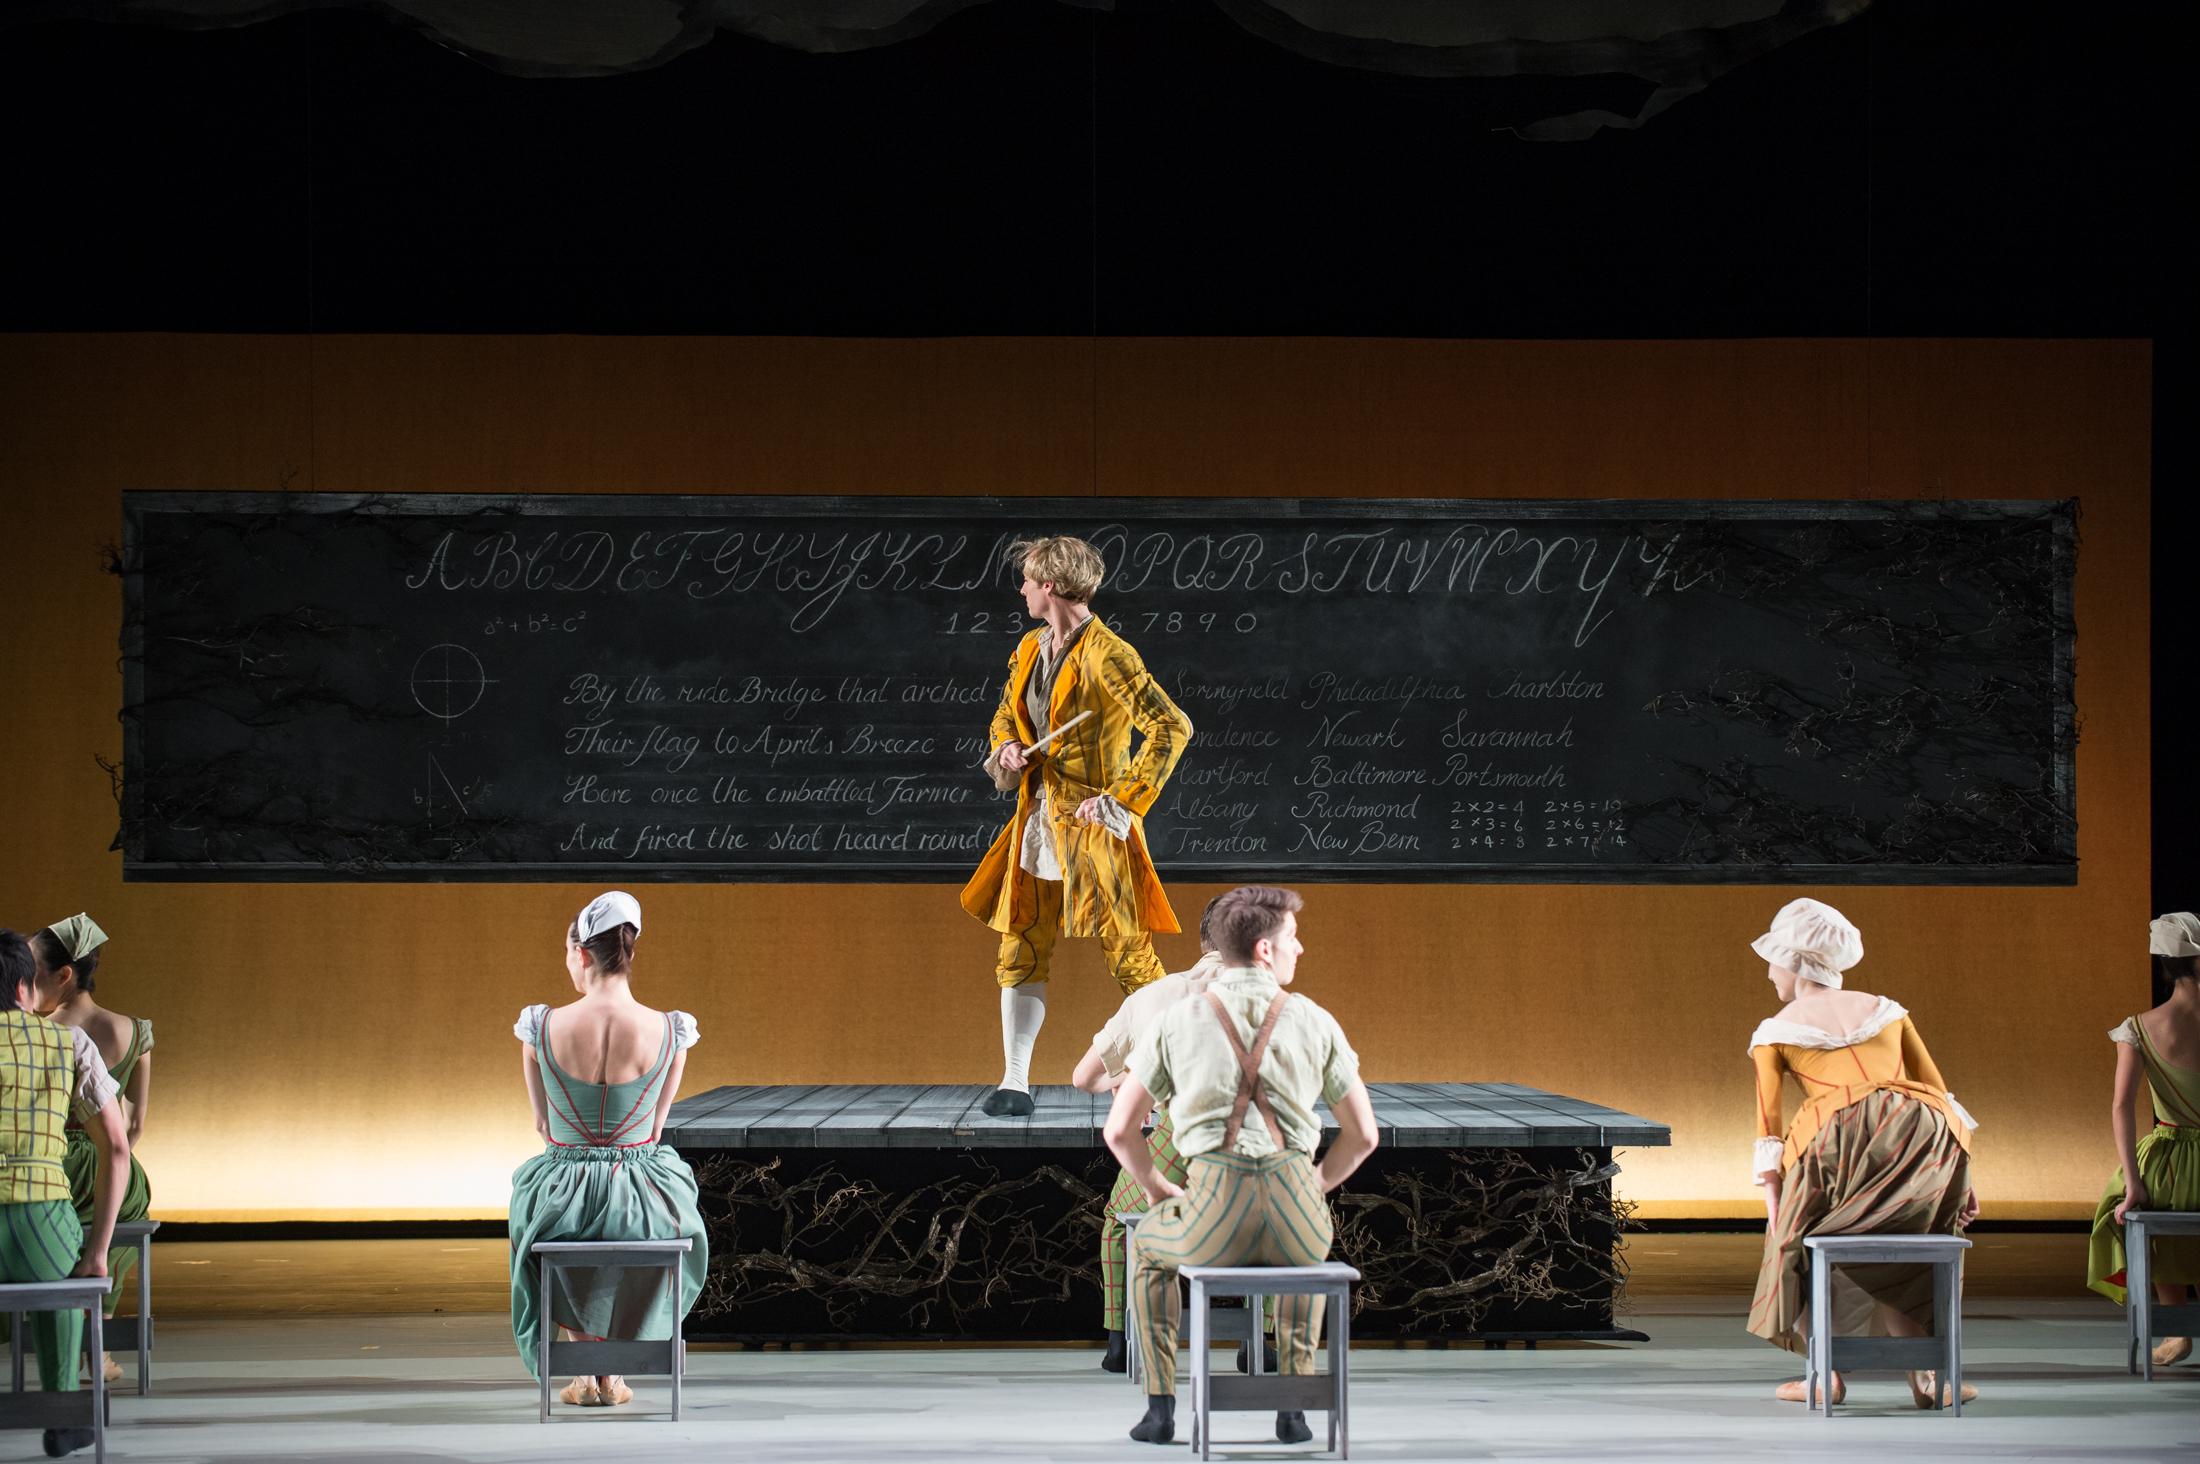 Photo creditby Theo Kossenas – Media4Artists courtesy of the Washington Ballet